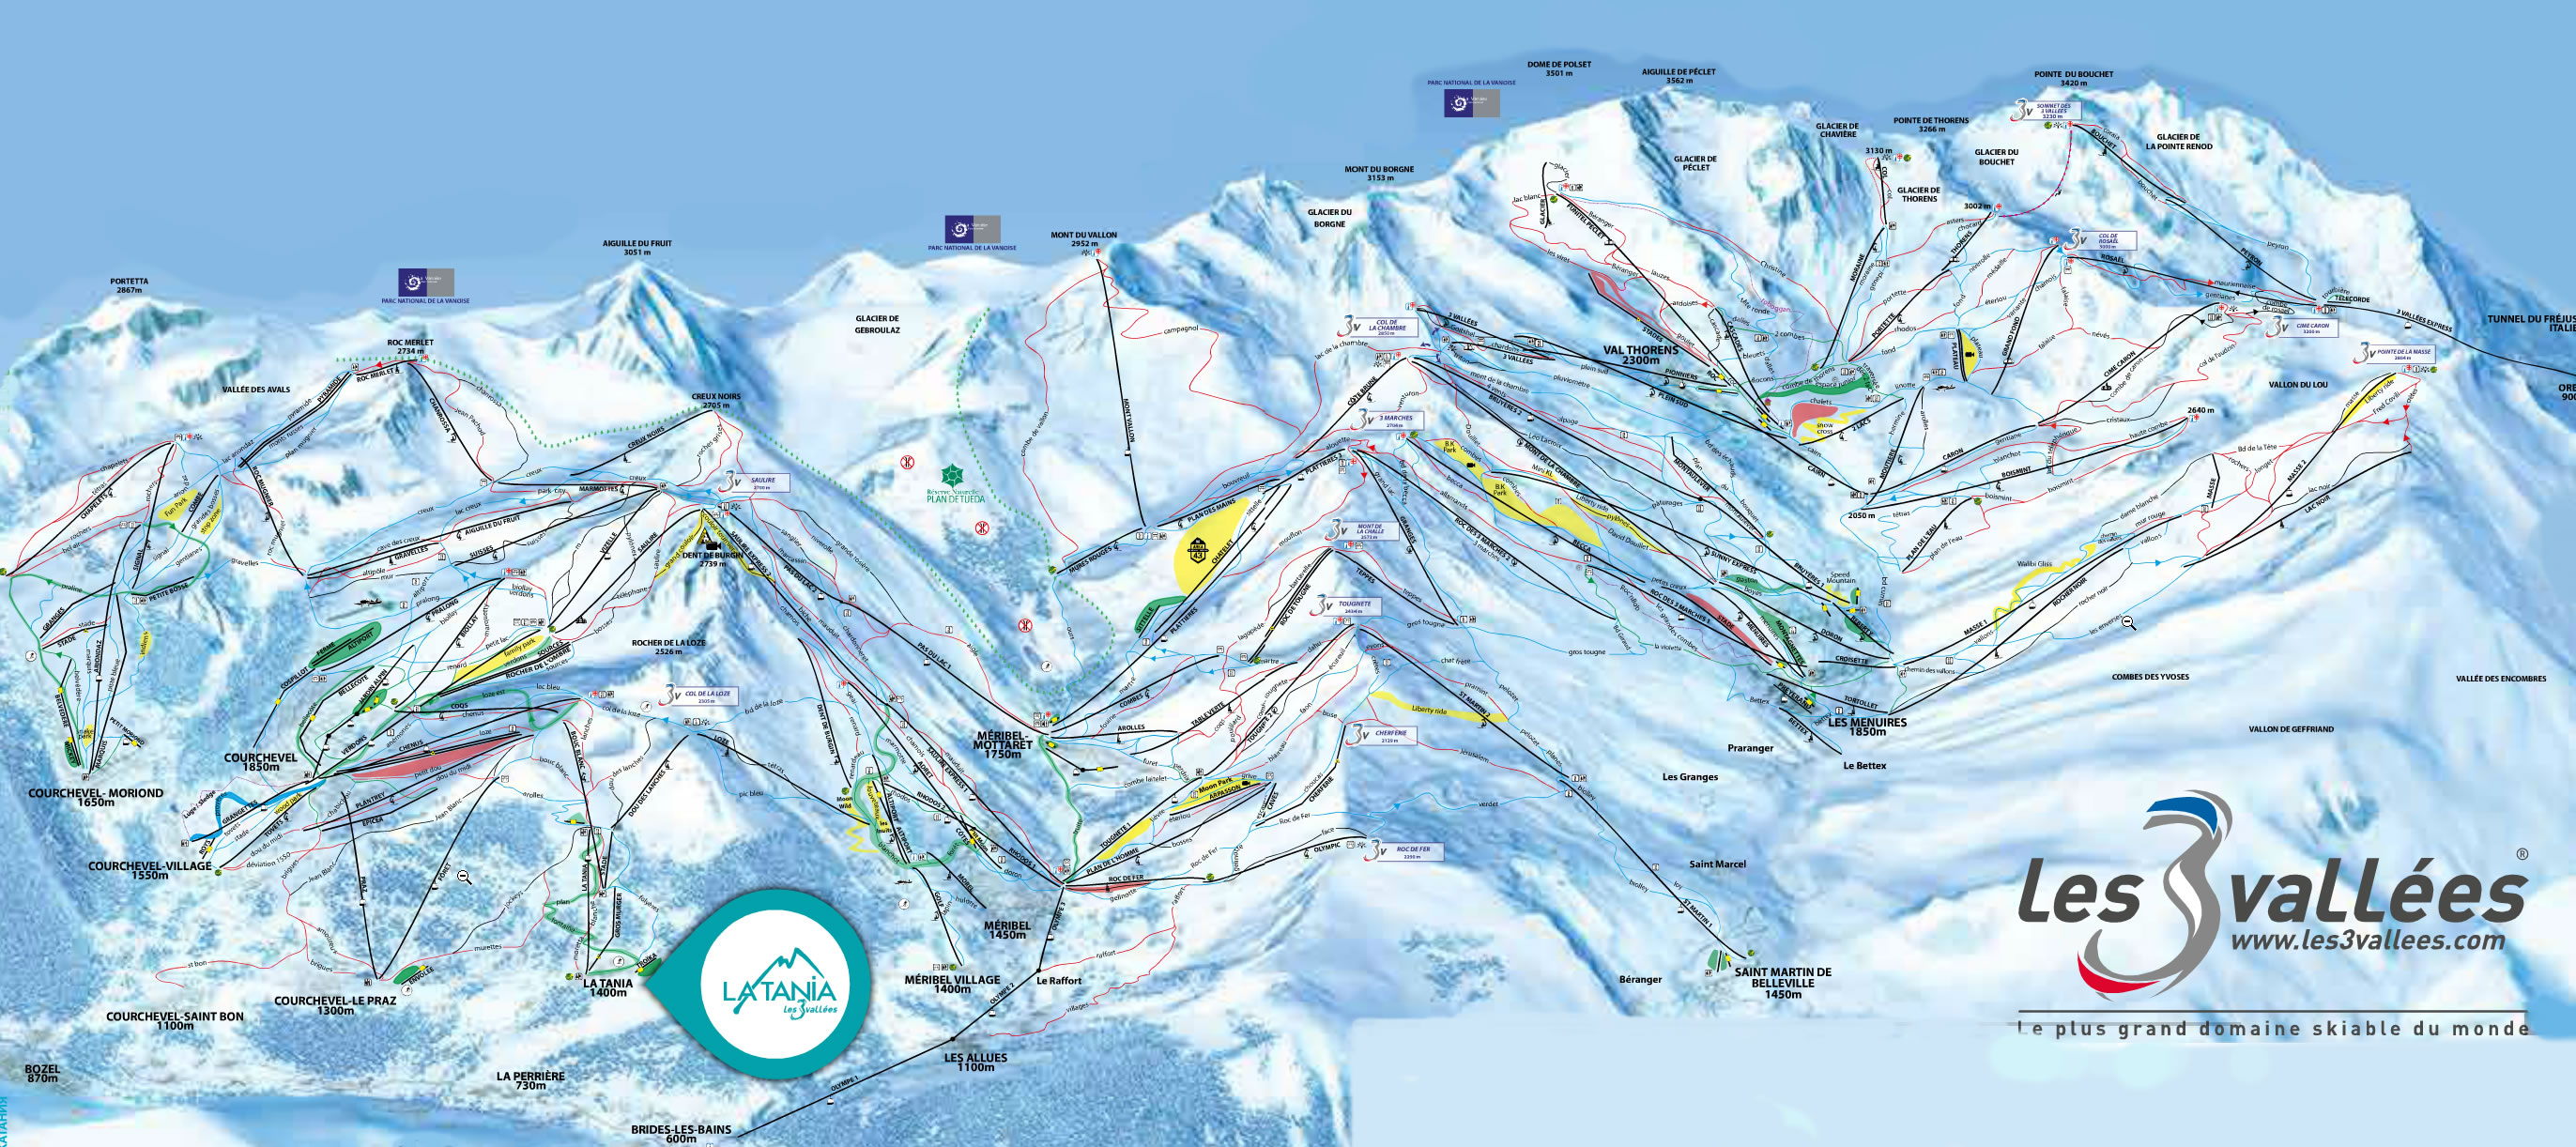 la tania piste map winter 2019. courchevel piste map. 3 valleys